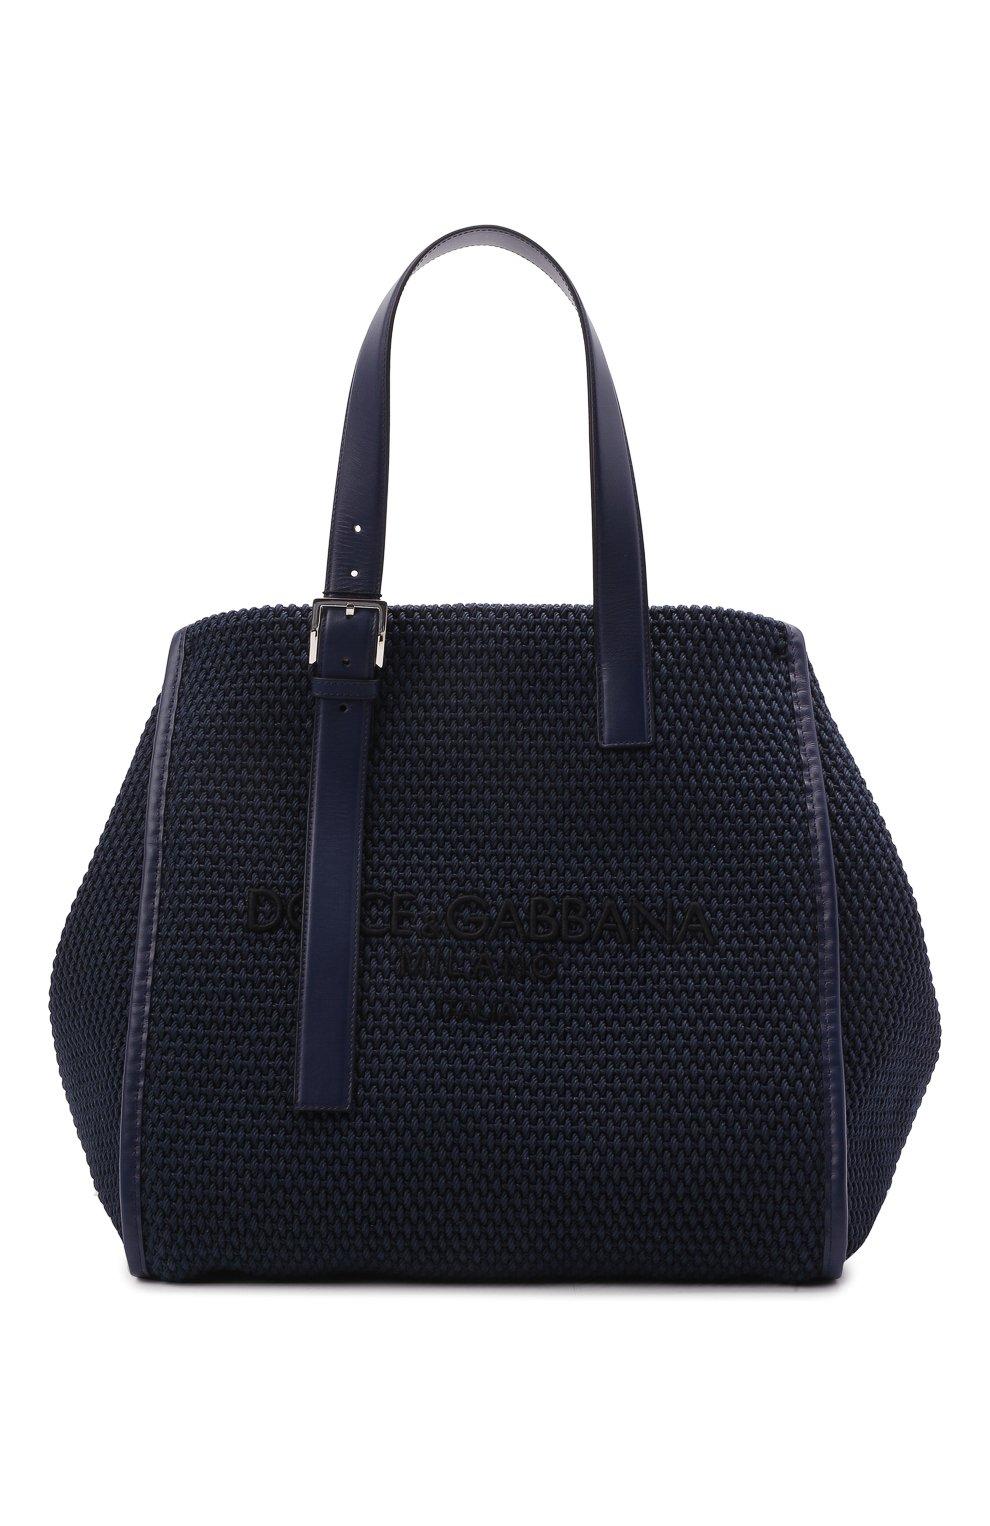 Мужская текстильная сумка-шопер DOLCE & GABBANA темно-синего цвета, арт. BM1834/A0307   Фото 1 (Материал: Текстиль)